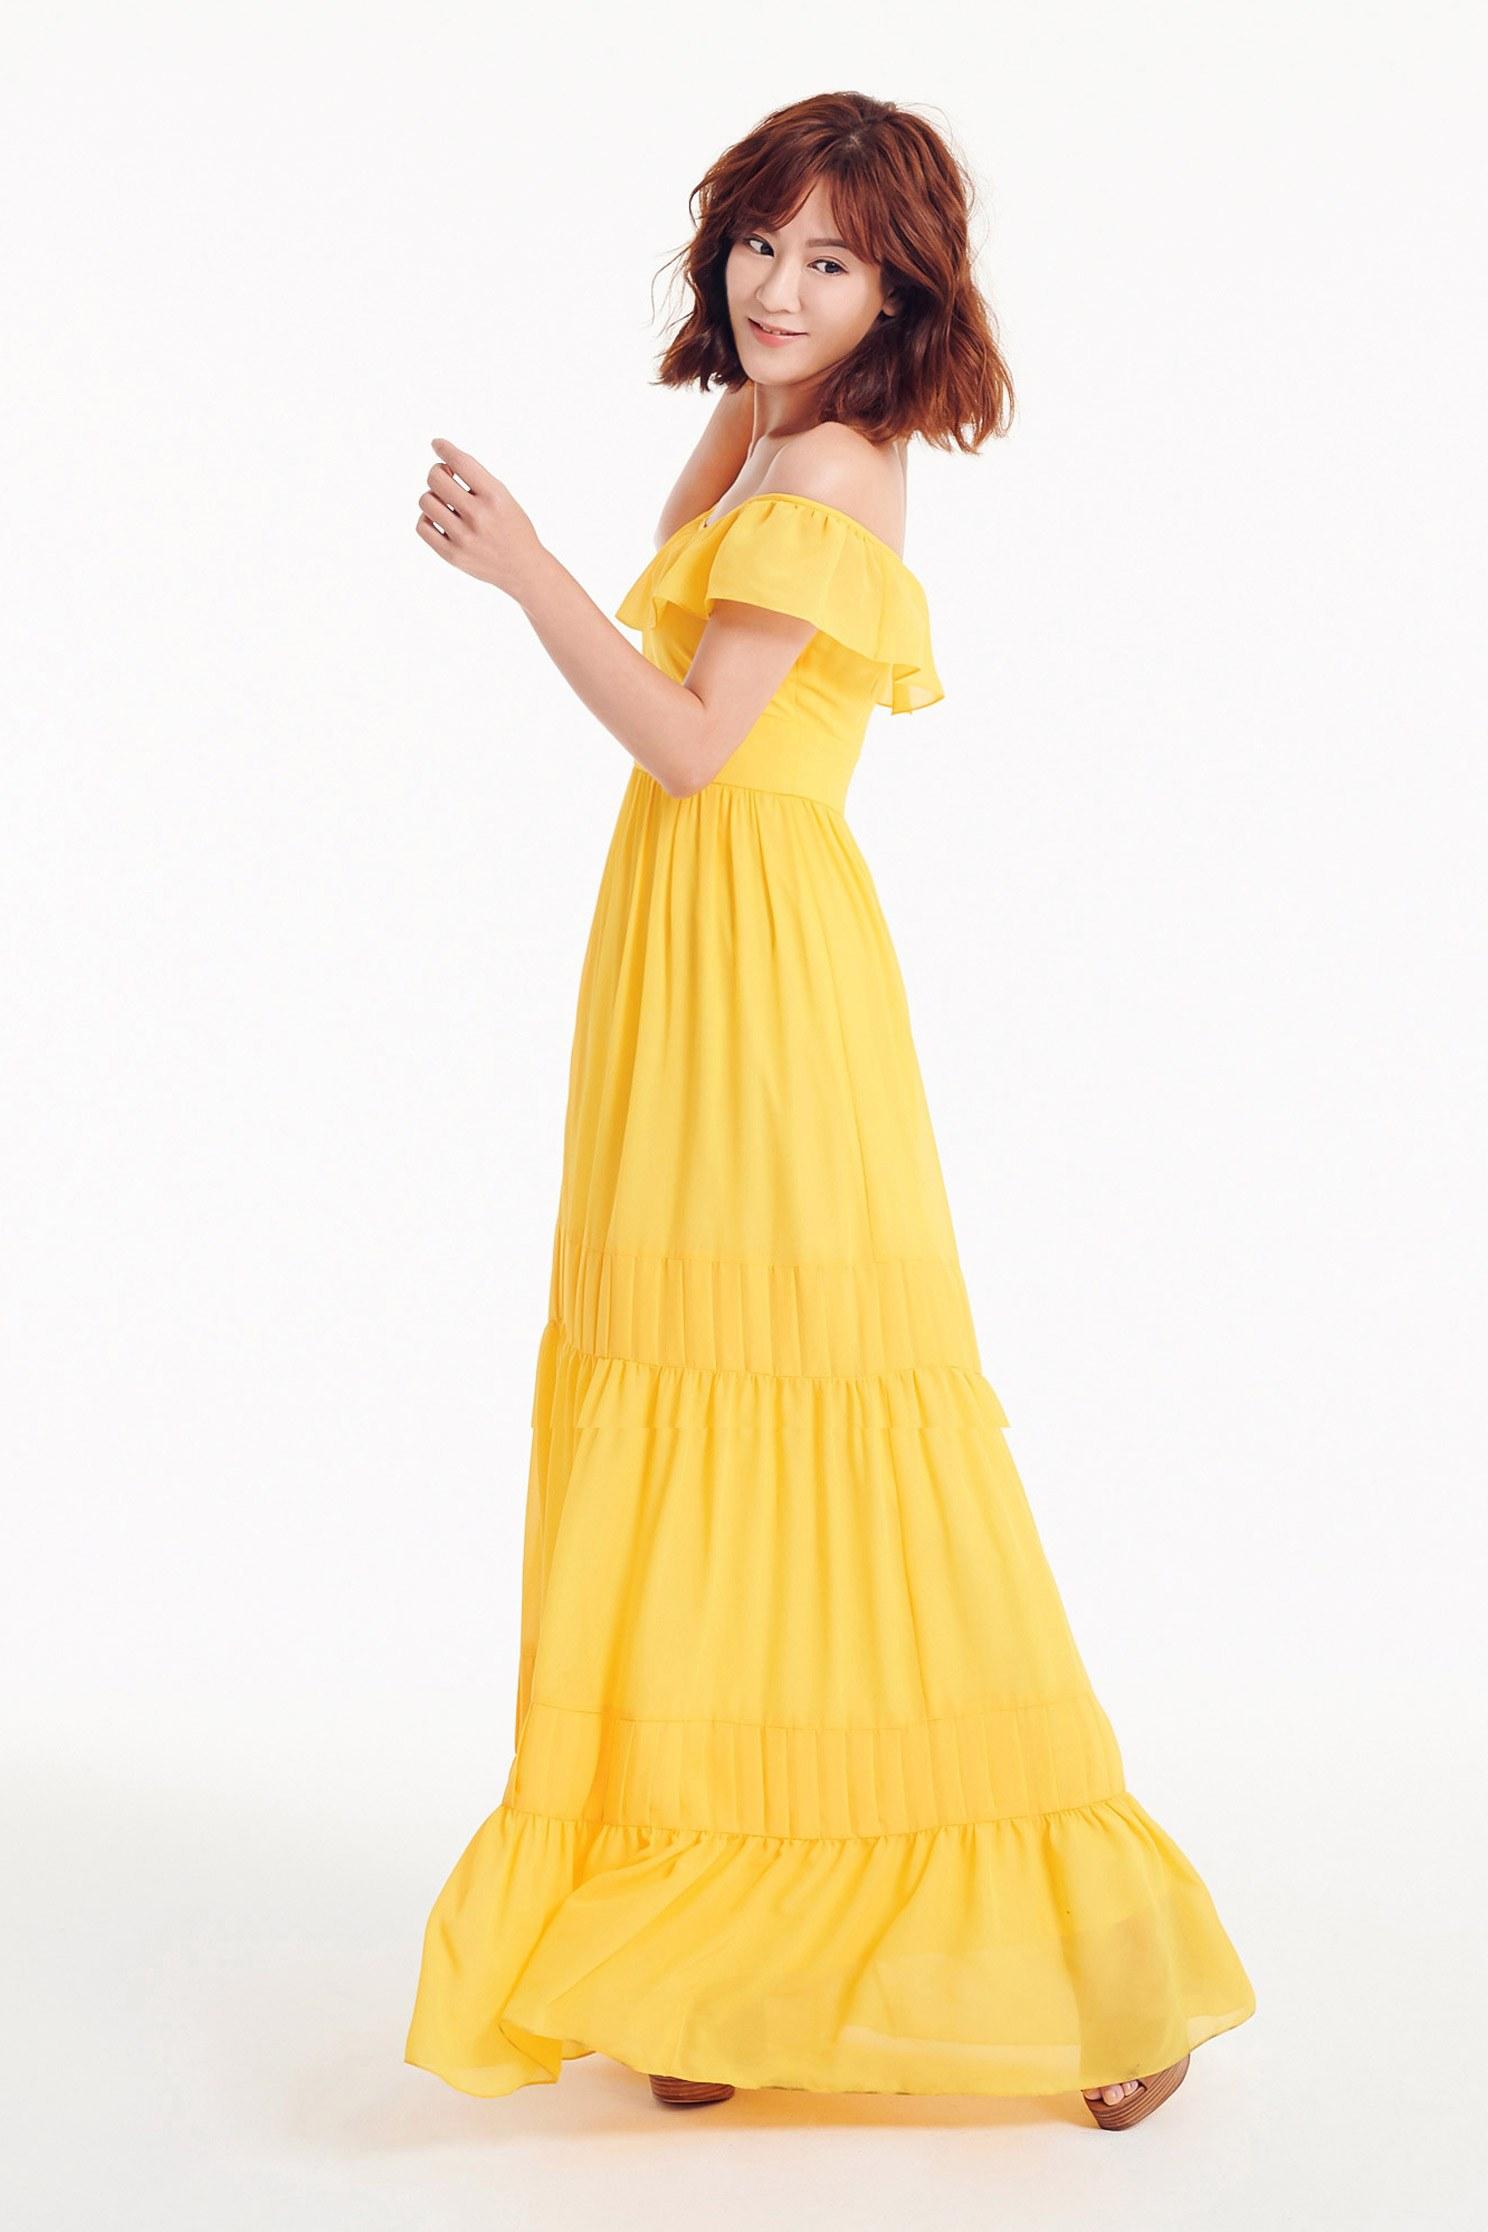 Lotus leaf long dress,onlinelimitededition,cocktaildress,watersigns,shortsleevedress,onepiecedress,longdress,chiffondress